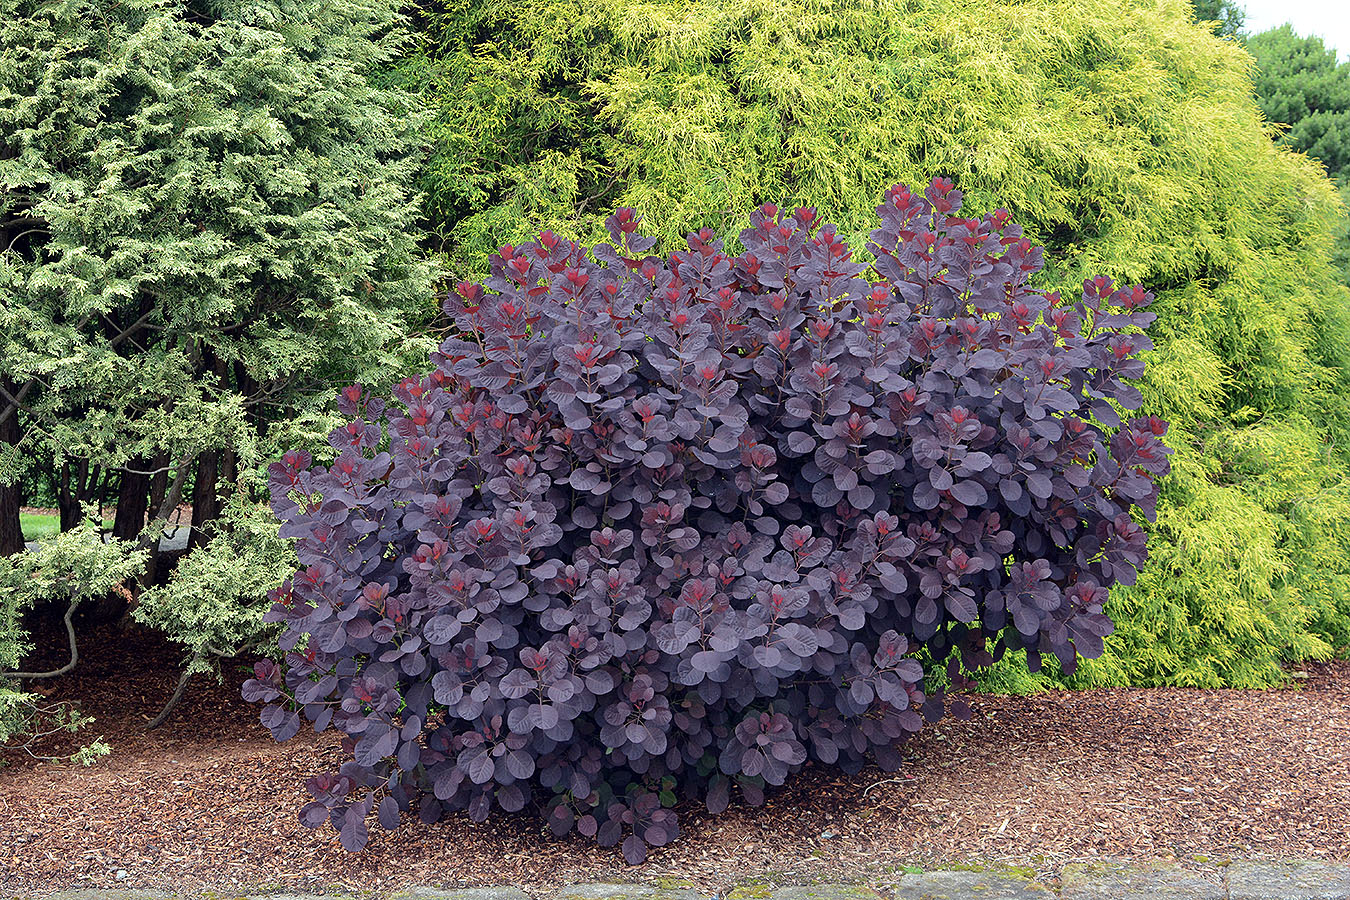 Cotinus coggyria 'Royal Purple' grown as a dieback shrub.